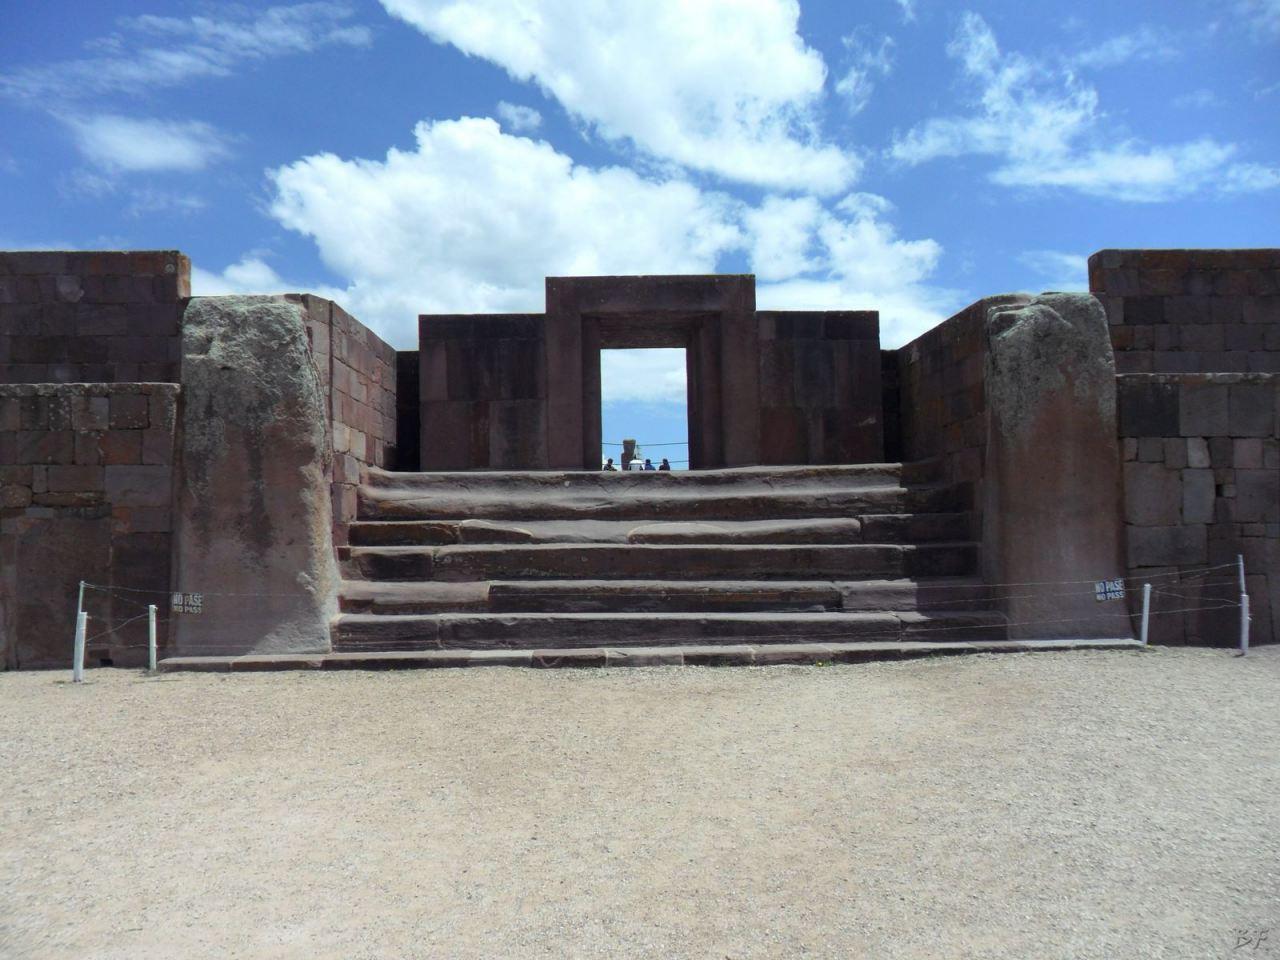 Sito-Megalitico-Piramide-Akapana-Kalasasaya-Menhir-Tiahuanaco-Bolivia-69